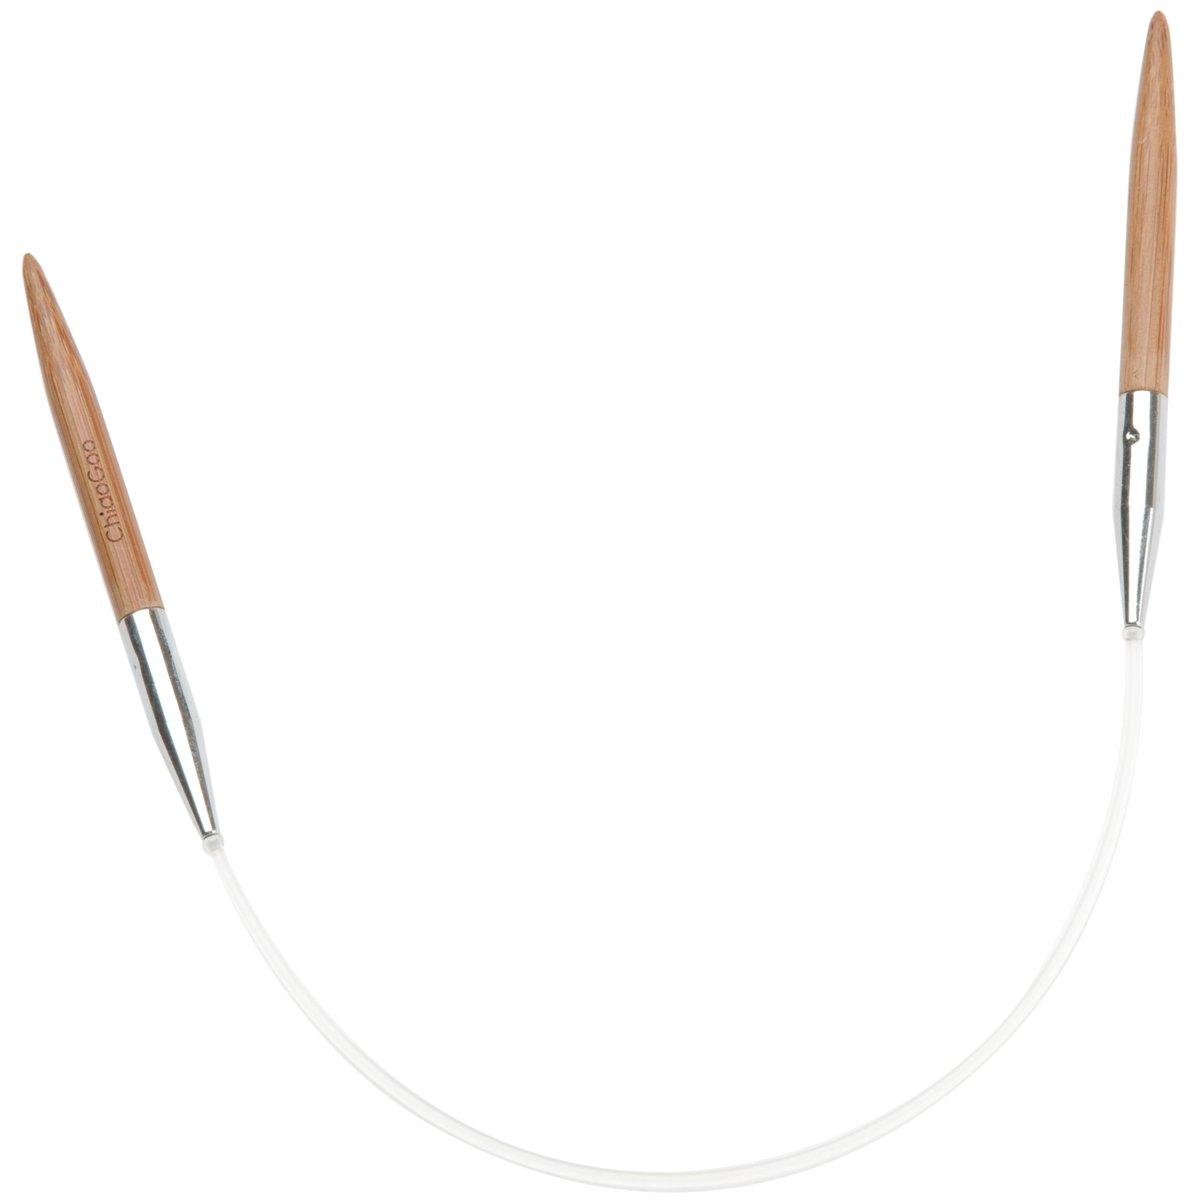 ChiaoGoo 9-Inch Bamboo Circular Knitting Needles, 6/4mm 2009-6